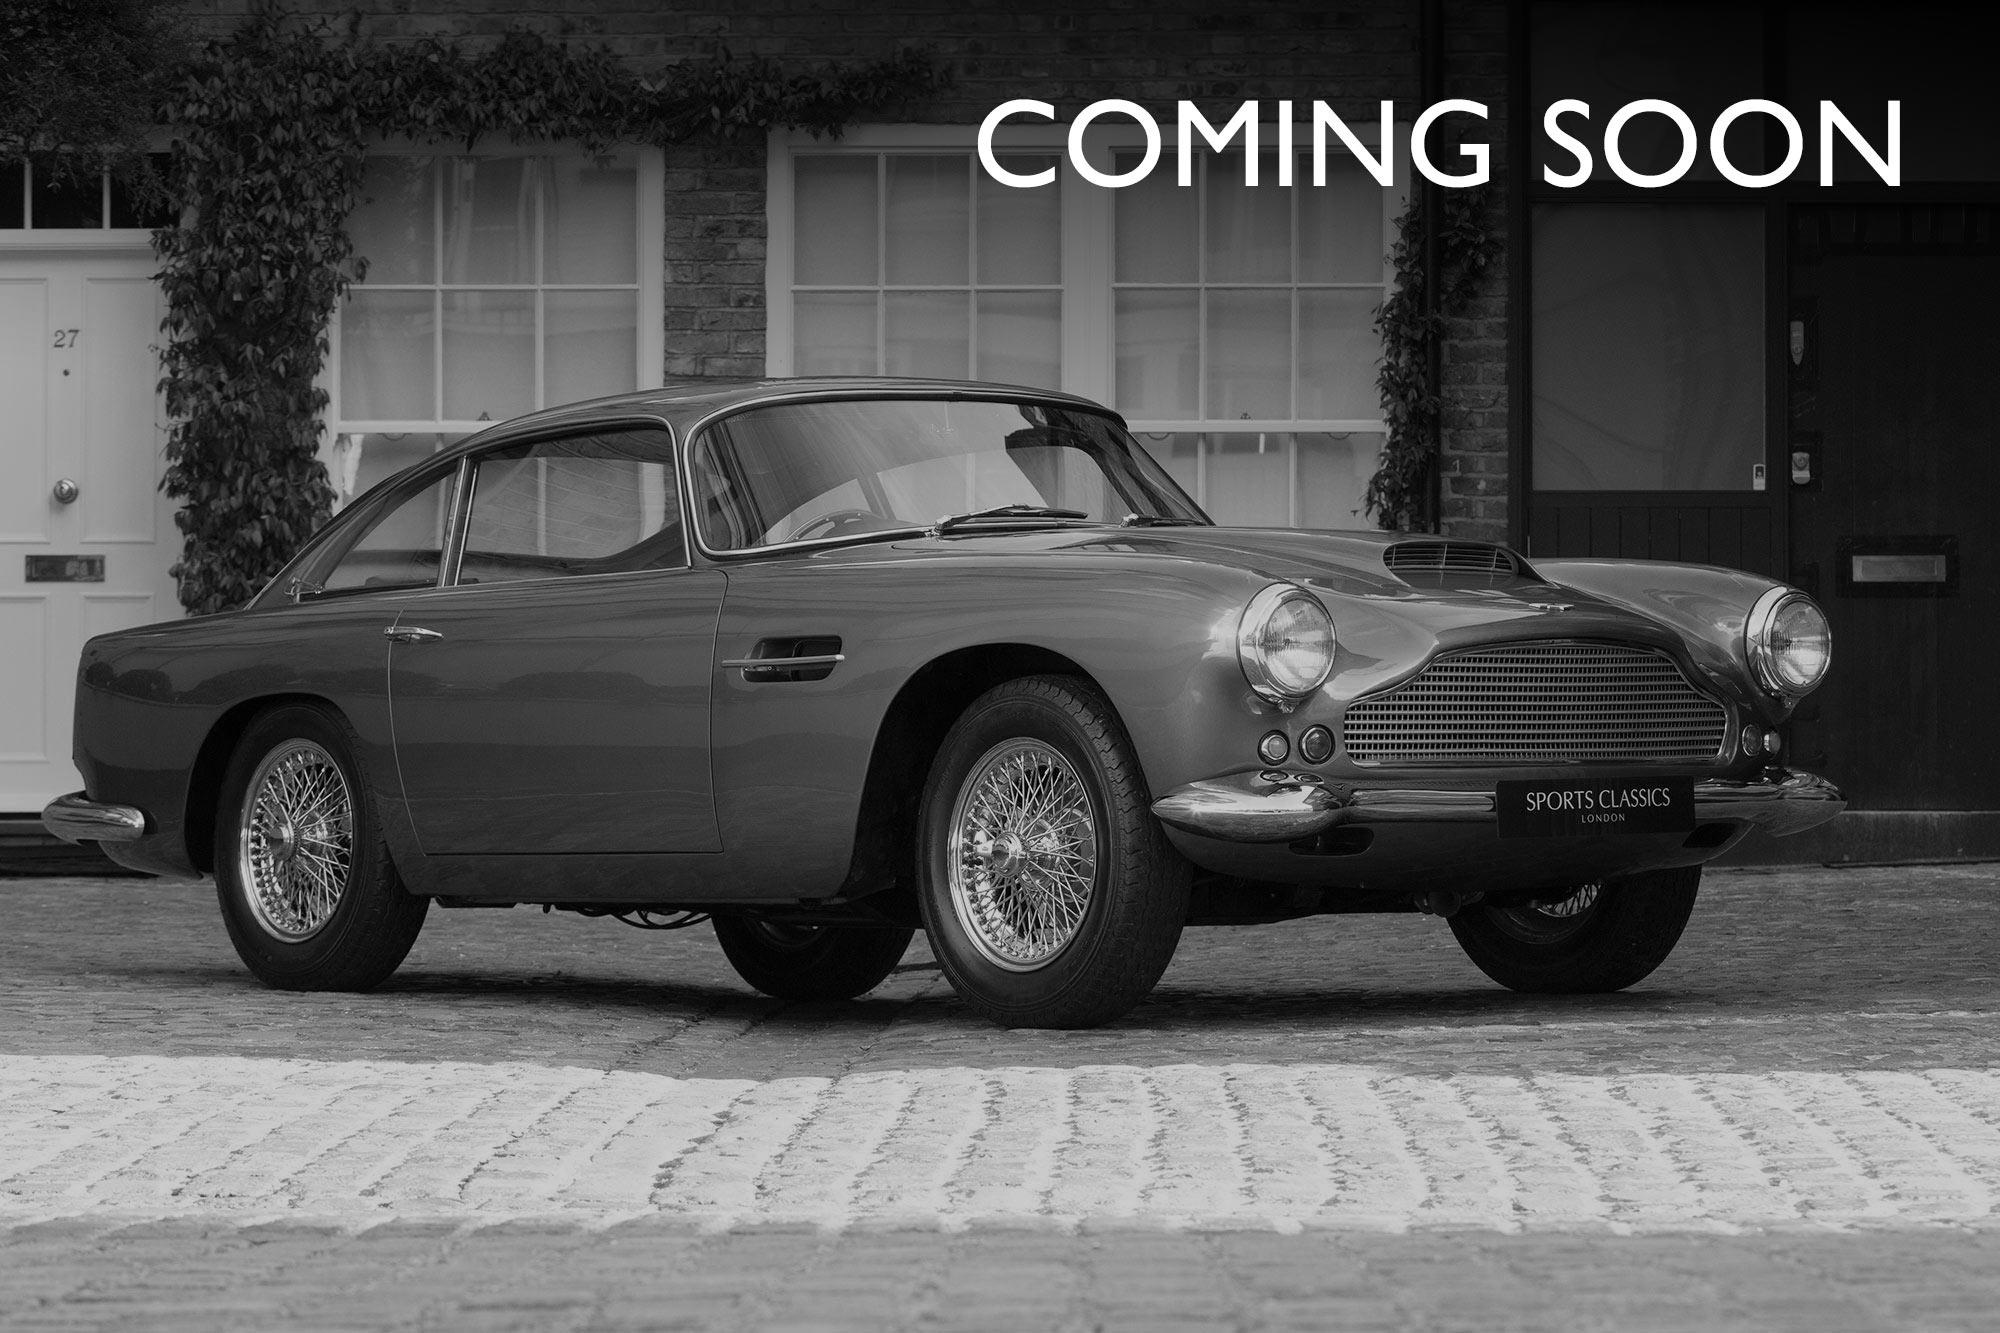 1958 Aston Martin Db4 Vintage Car For Sale